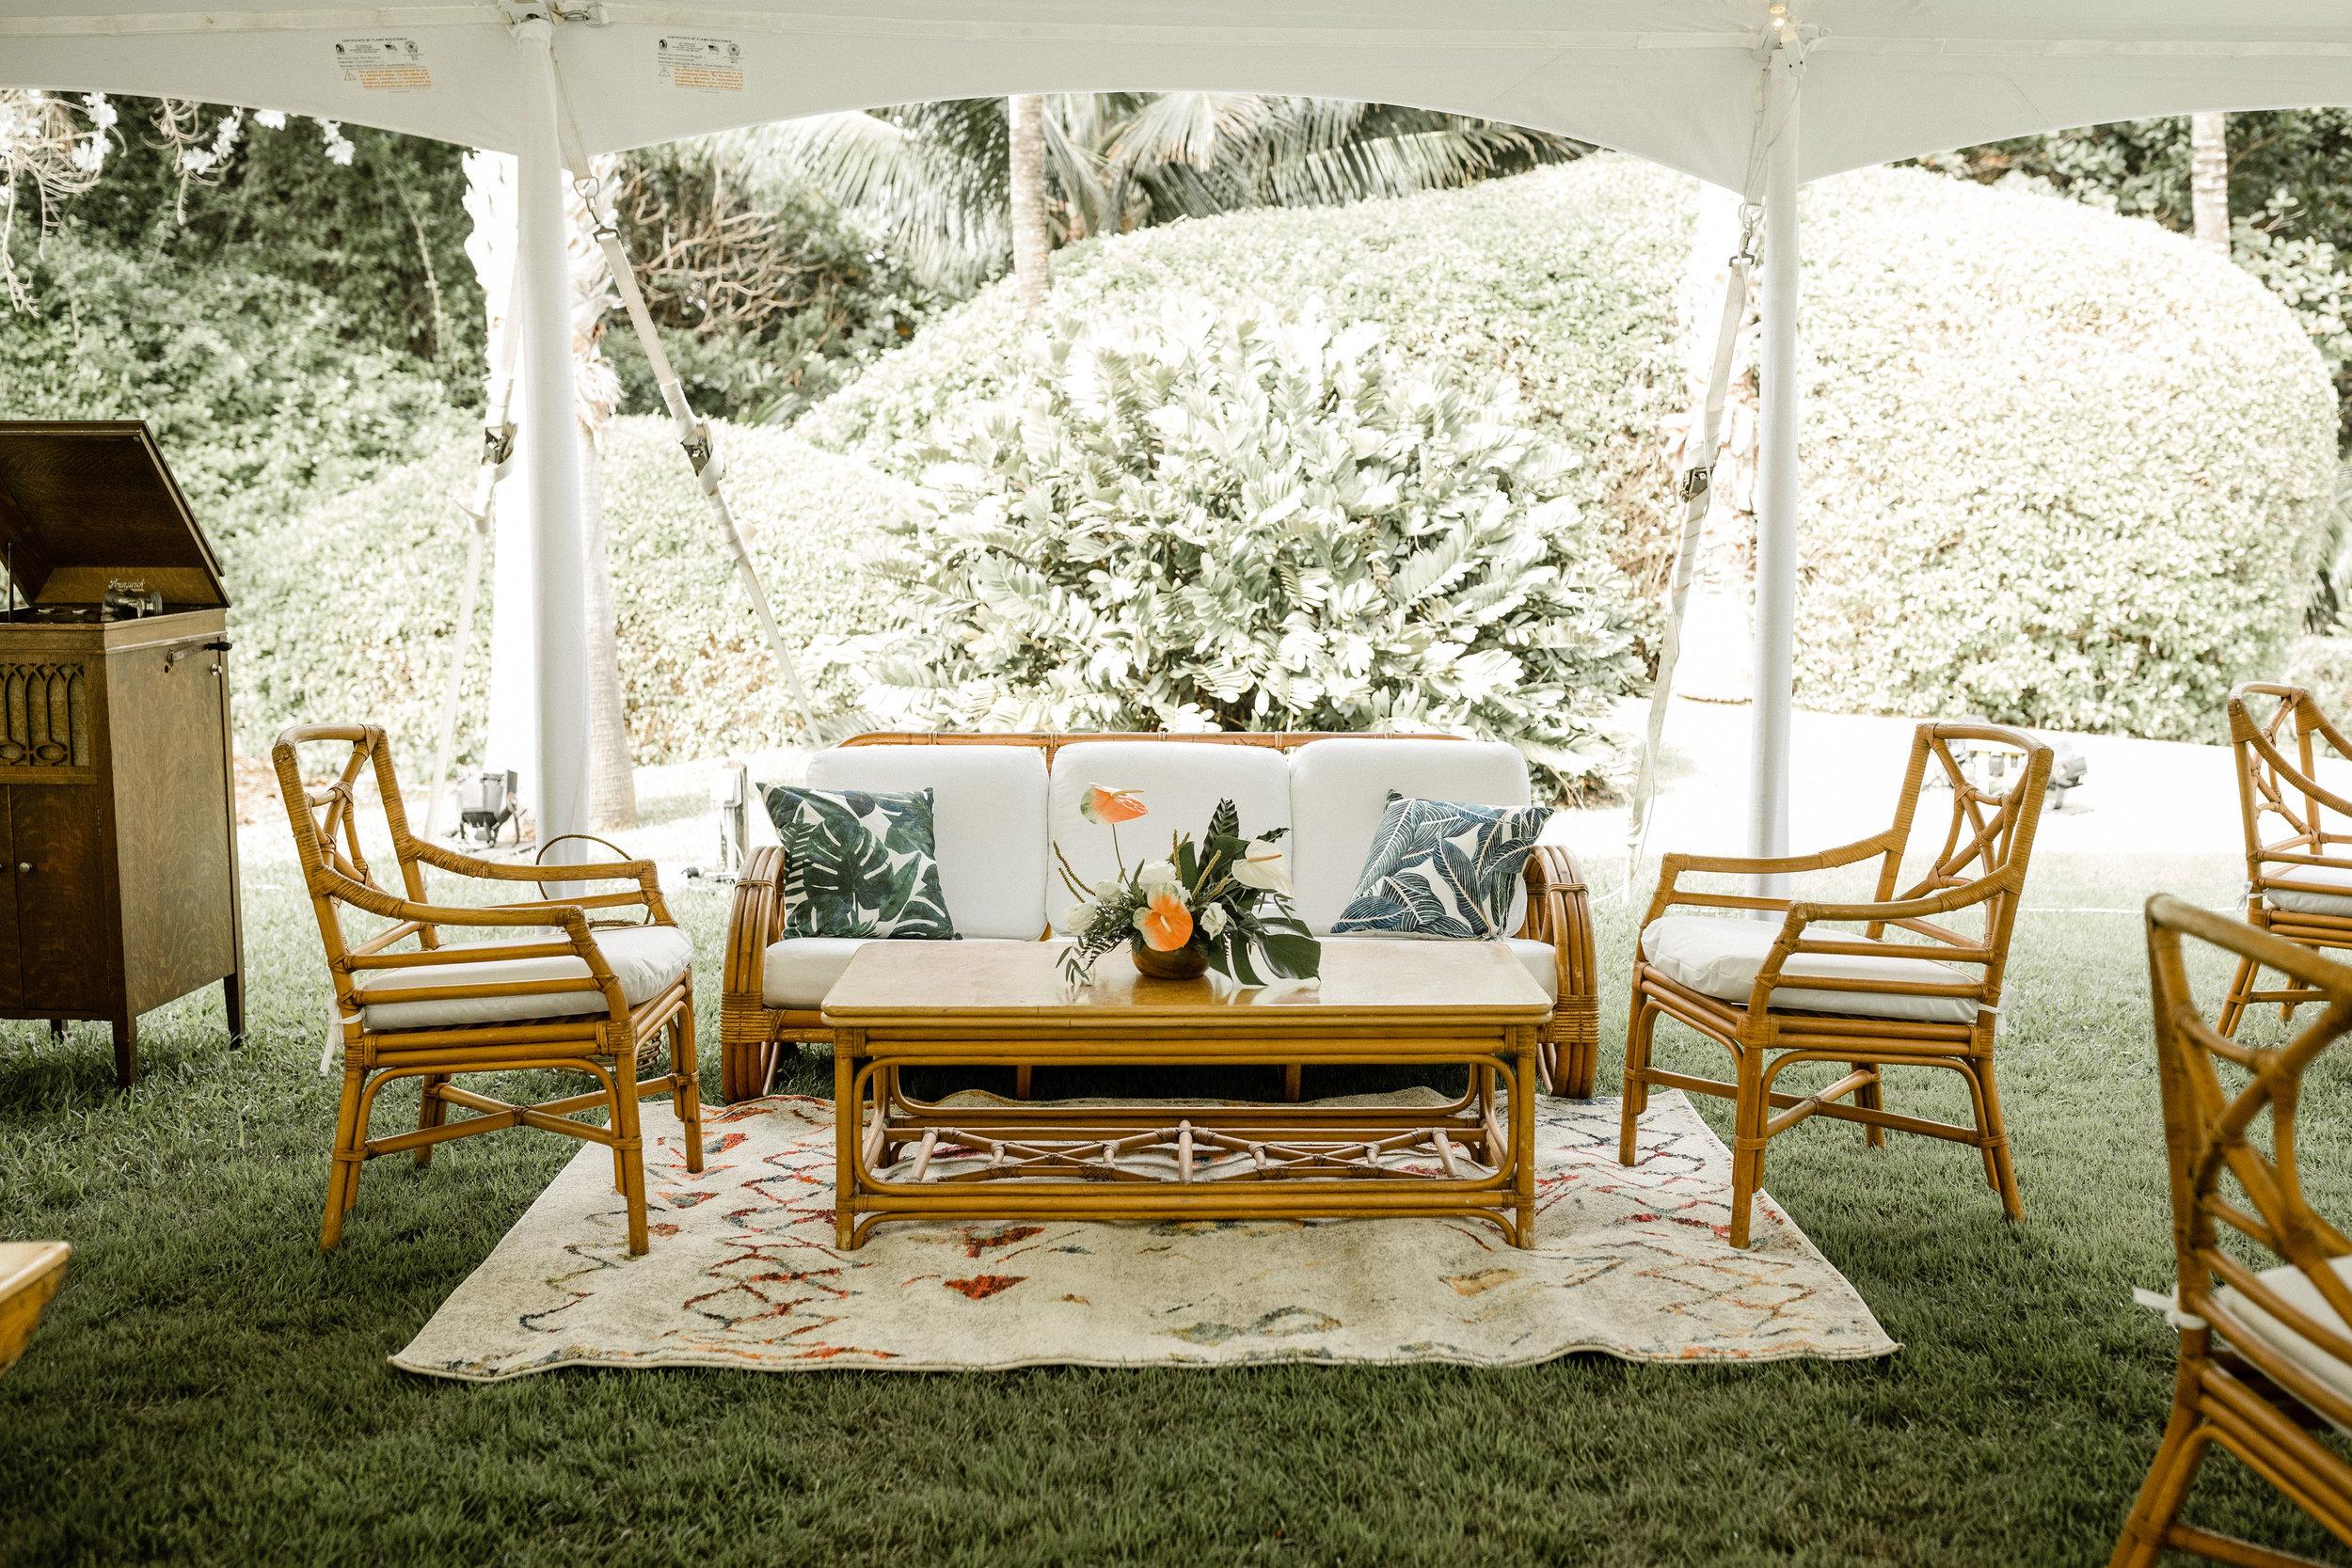 Kawaii Rentals - Lounge and decor